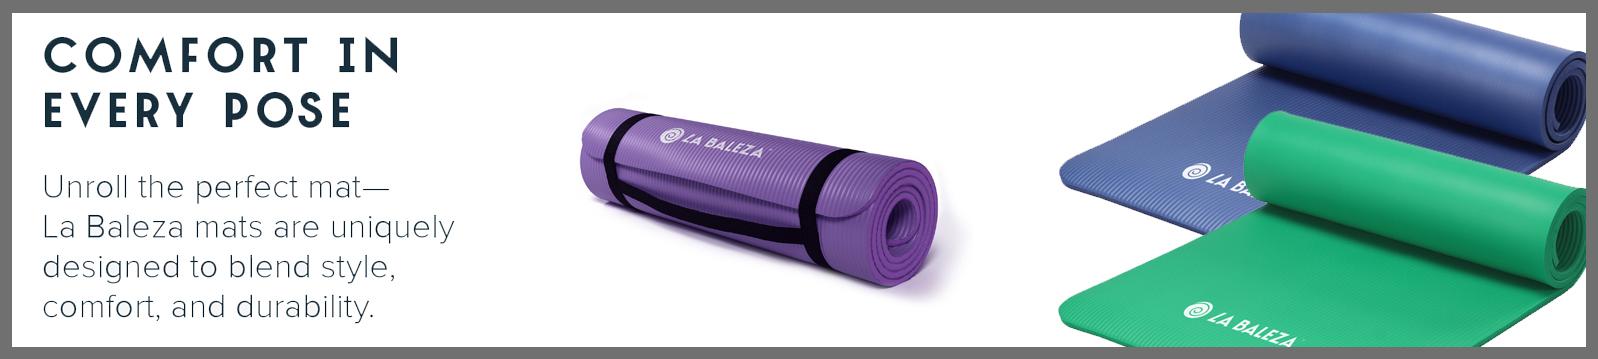 yoga-perfectpose2.jpg